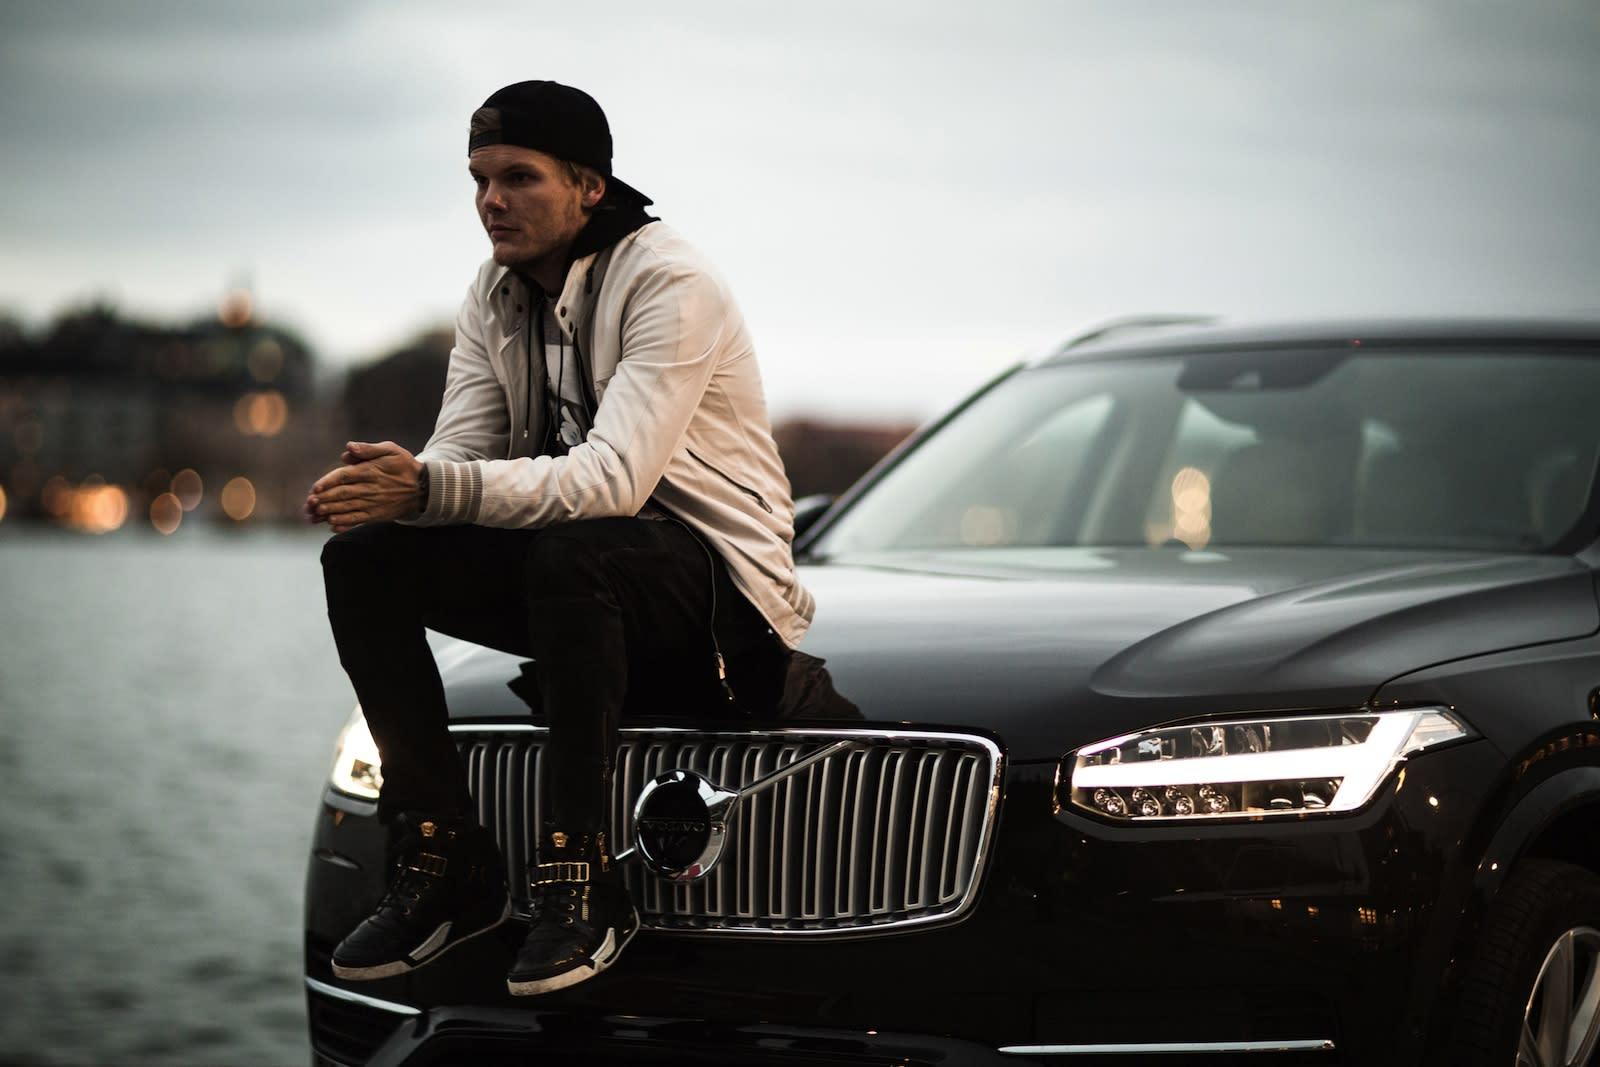 Volvo Xc90 Commercial >> TVCM*VOLVO×Avicii - DAILY VOLVO LIFE